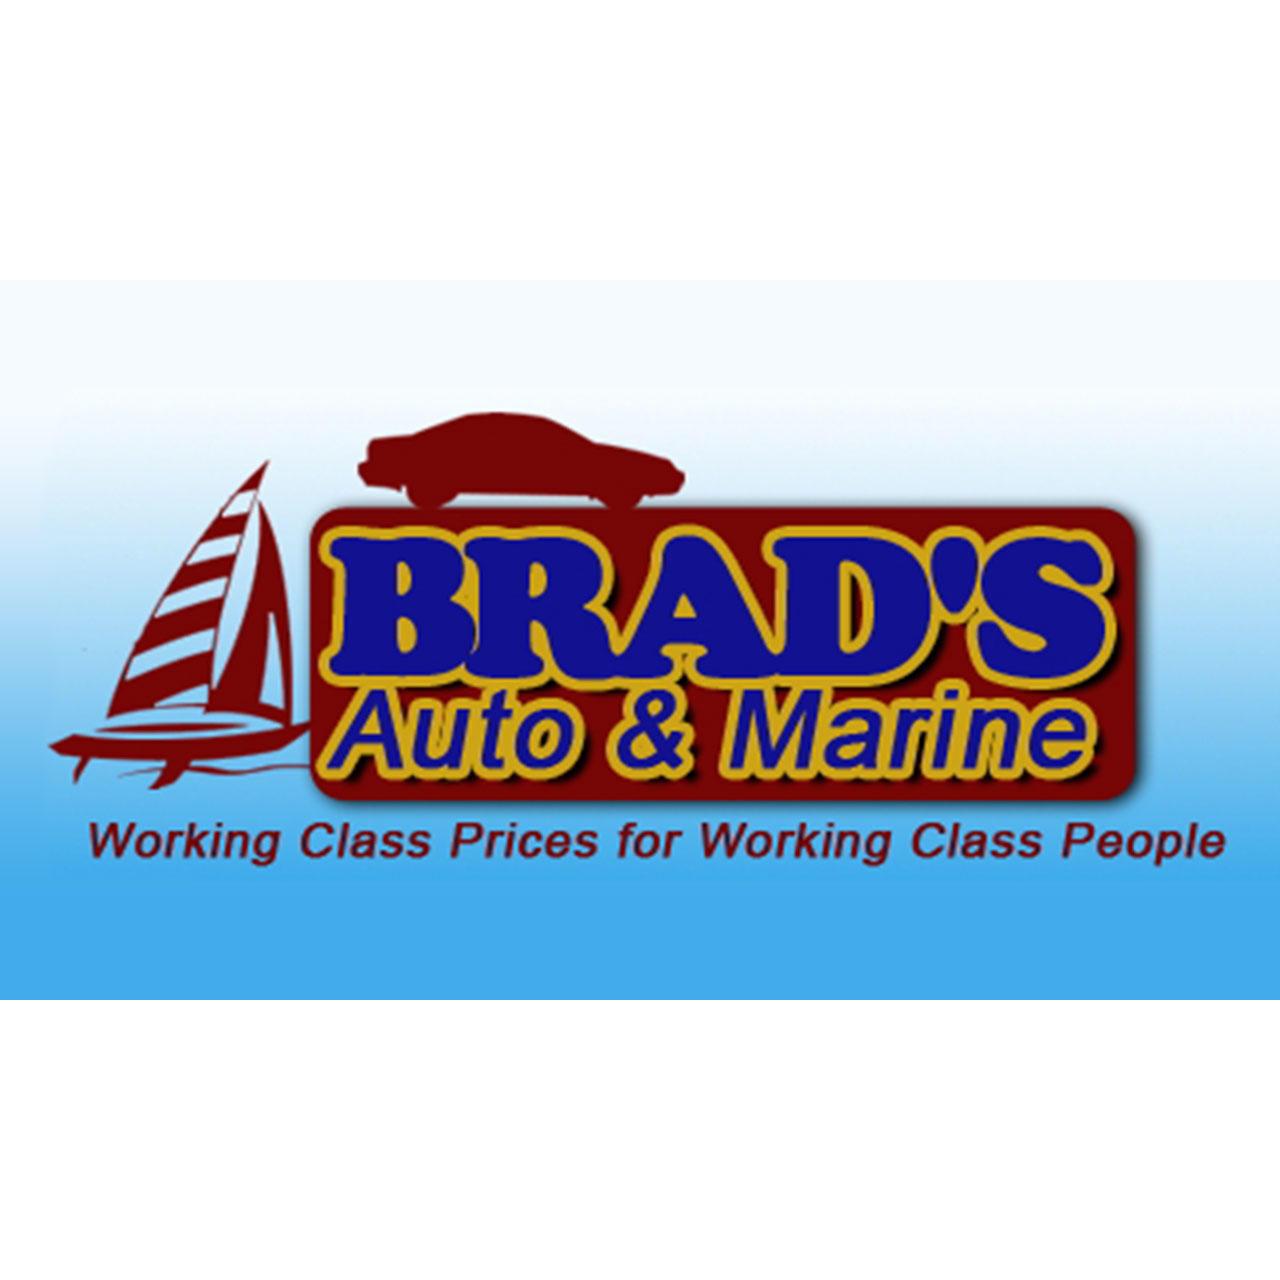 Brad's Auto & Marine